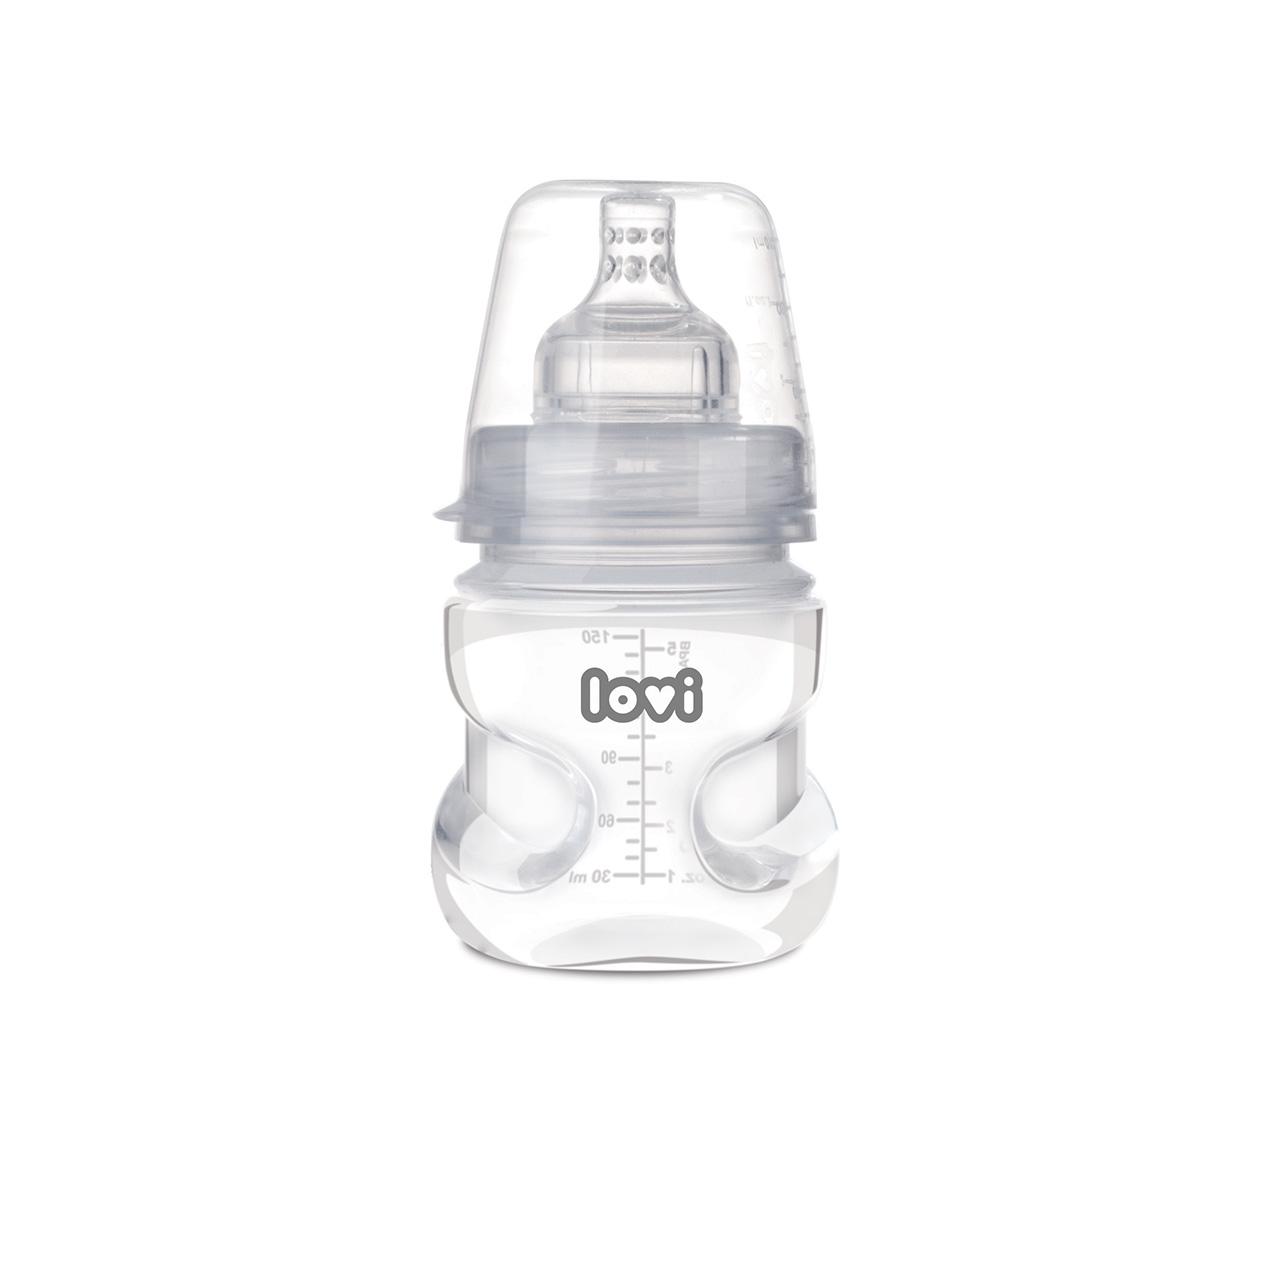 شیشه شیر کودک لاوی مدل 59212 ظرفیت 150 میلی لیتر